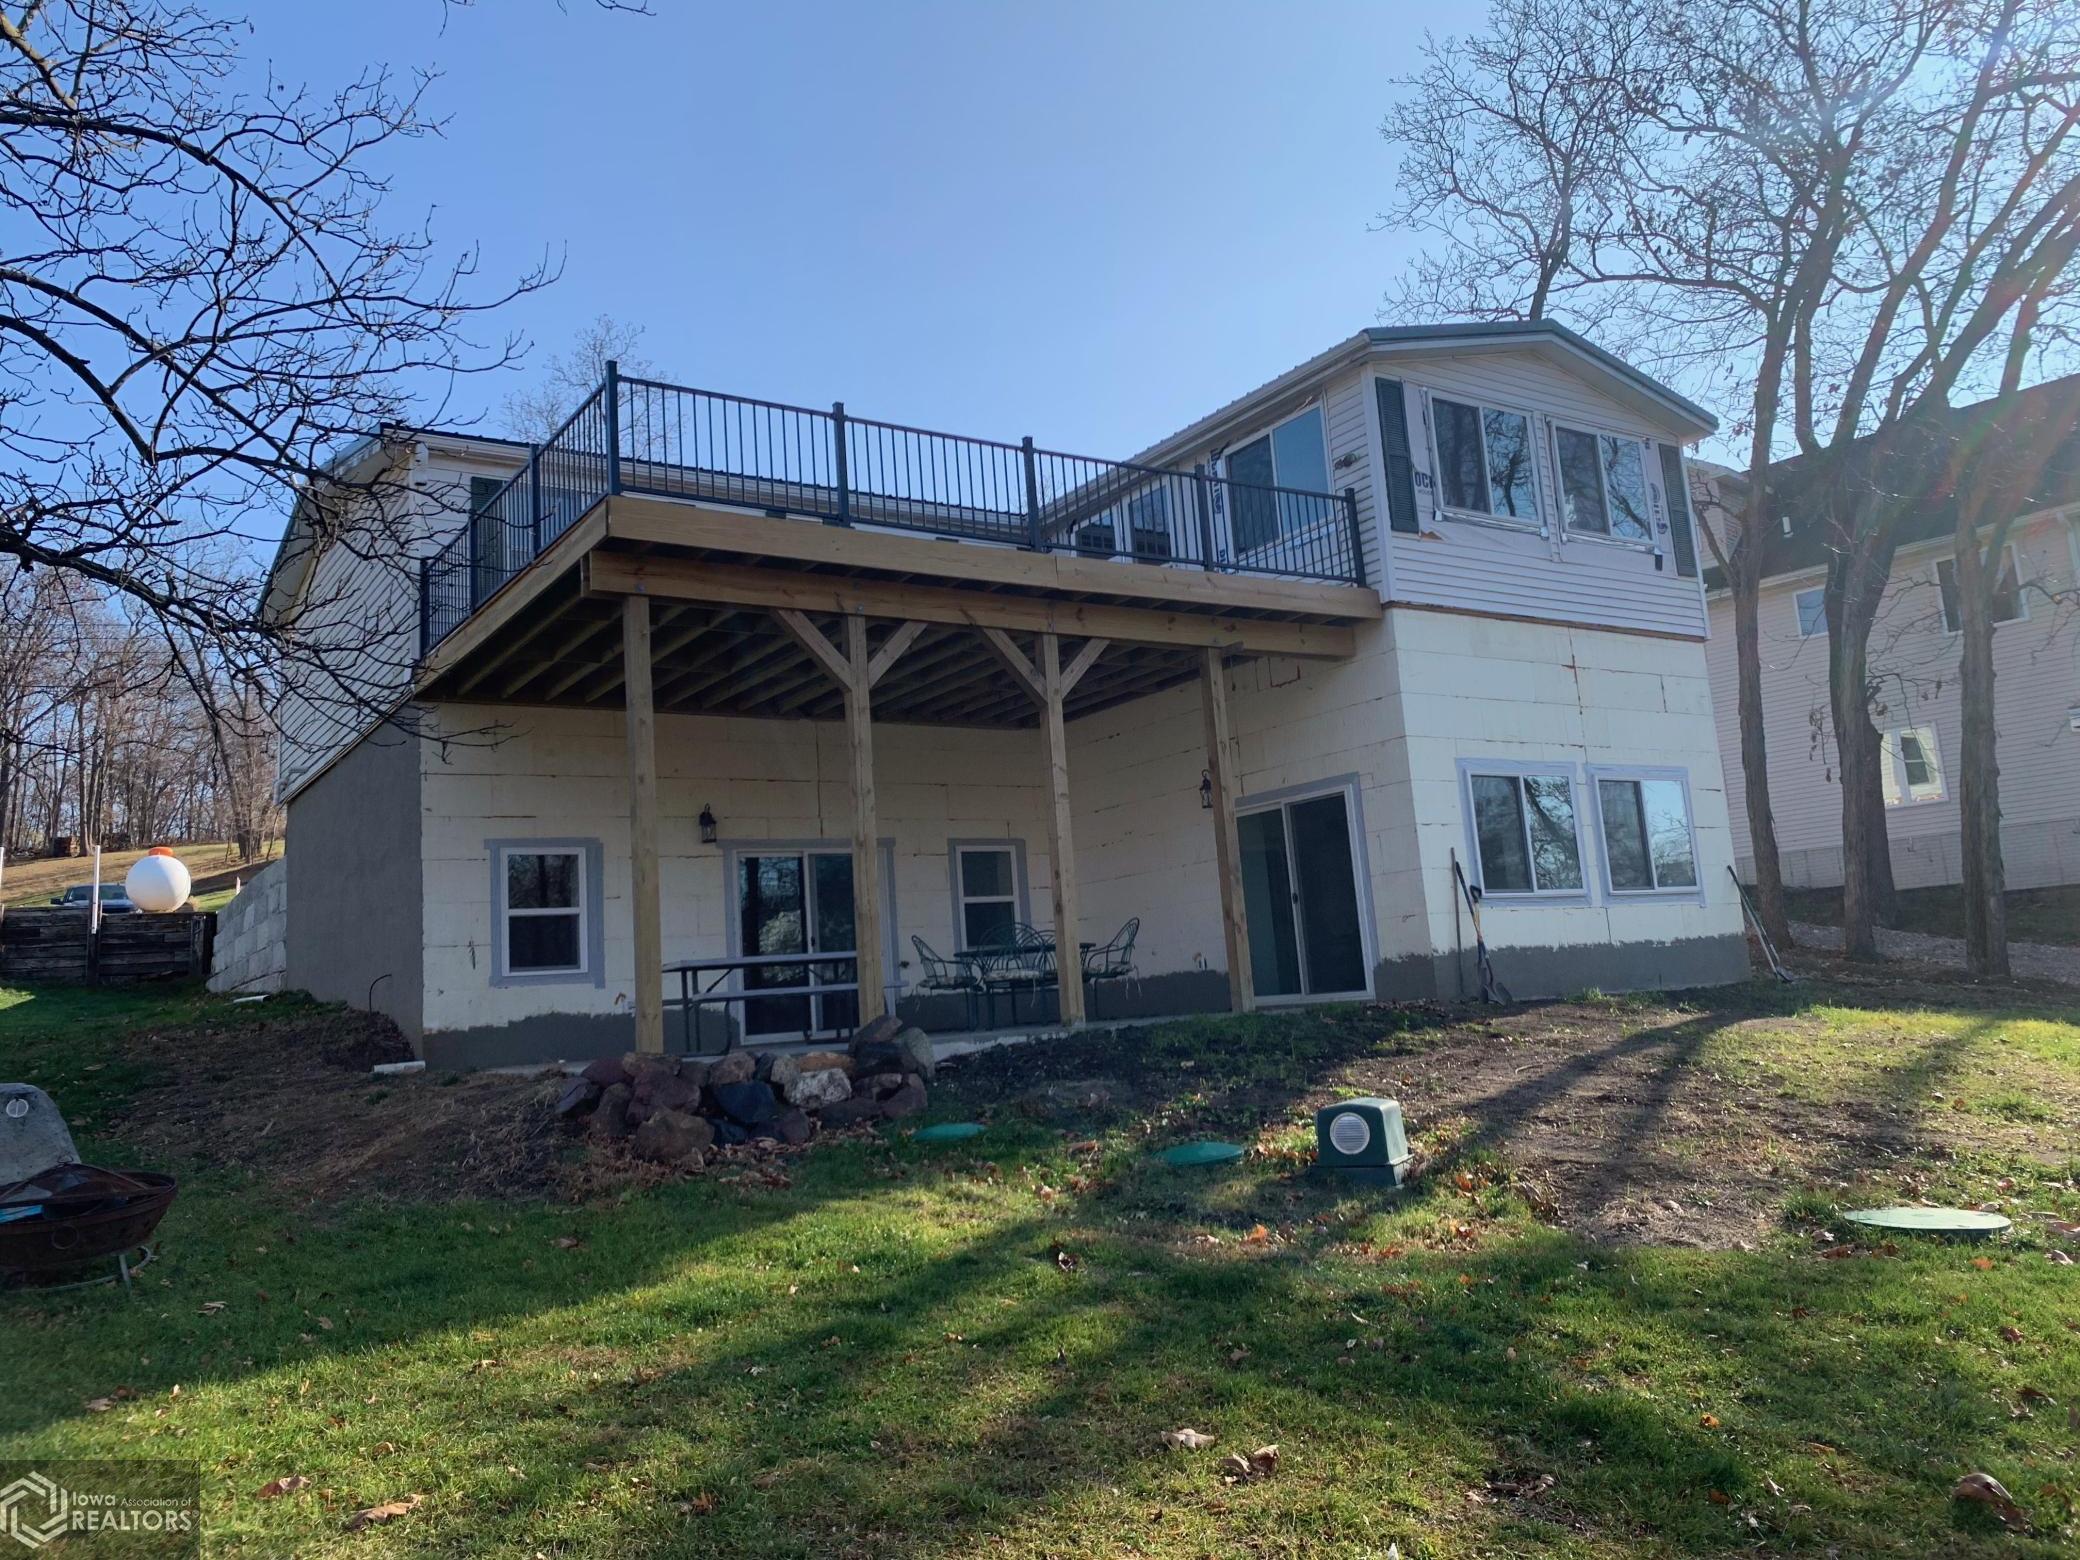 222 Hillcrest, Montezuma, Iowa 50171-4683, 6 Bedrooms Bedrooms, ,2 BathroomsBathrooms,Single Family,For Sale,Hillcrest,5677605